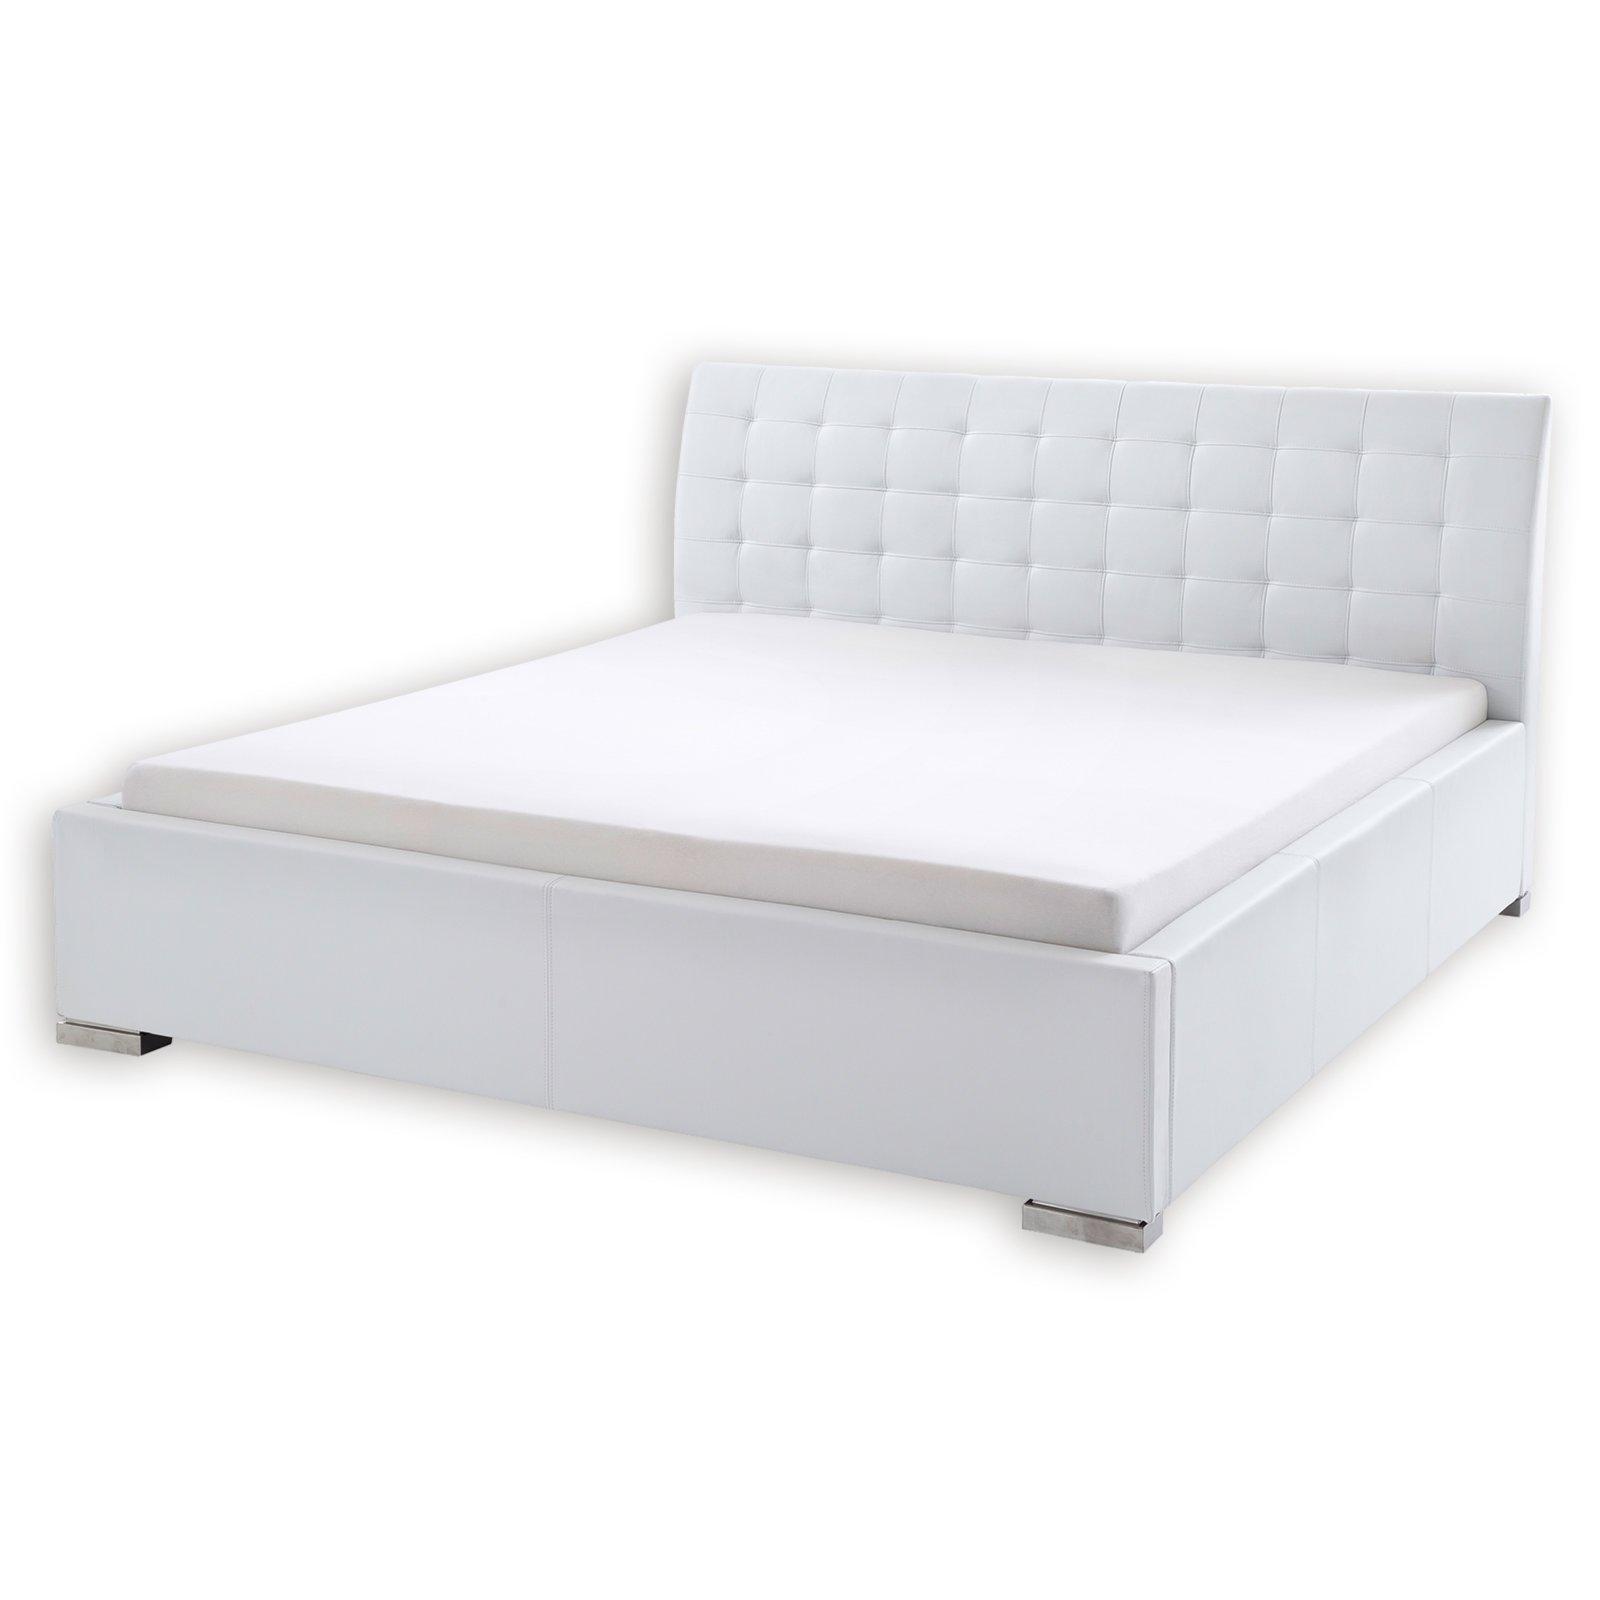 polsterbett isa comfort wei kunstleder 200x200 cm. Black Bedroom Furniture Sets. Home Design Ideas